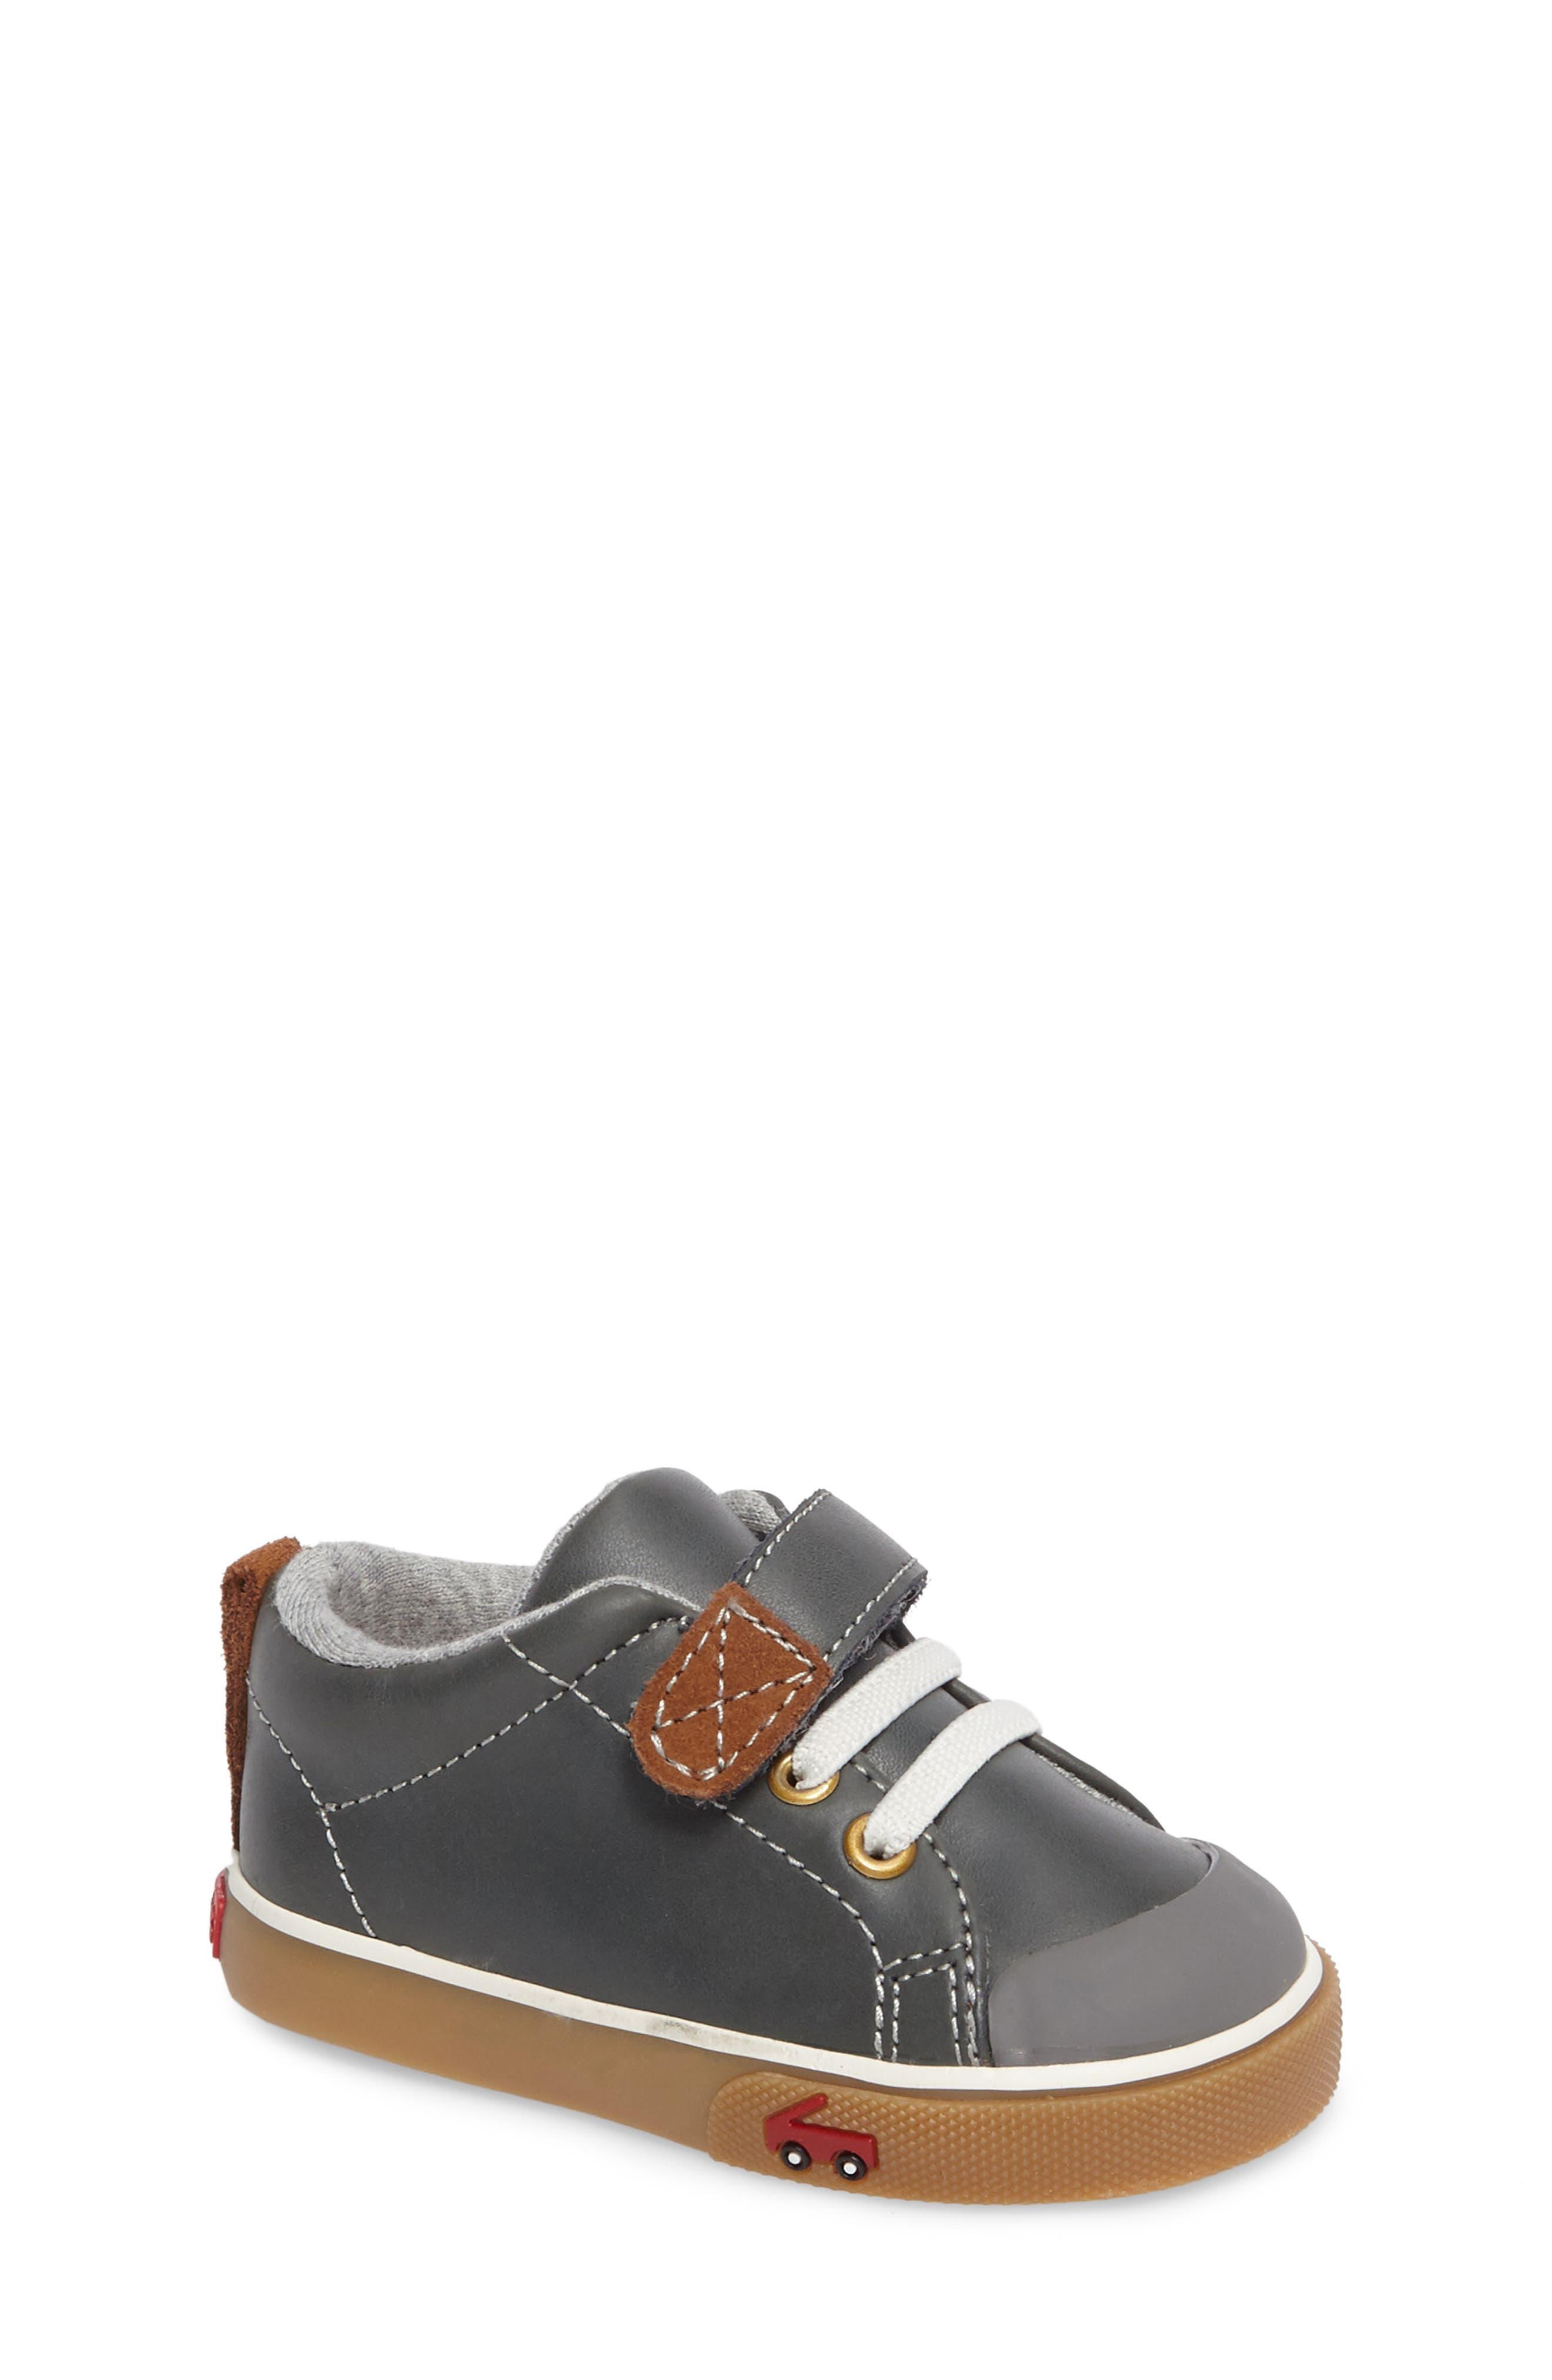 Stevie II Sneaker,                         Main,                         color, GREY LEATHER